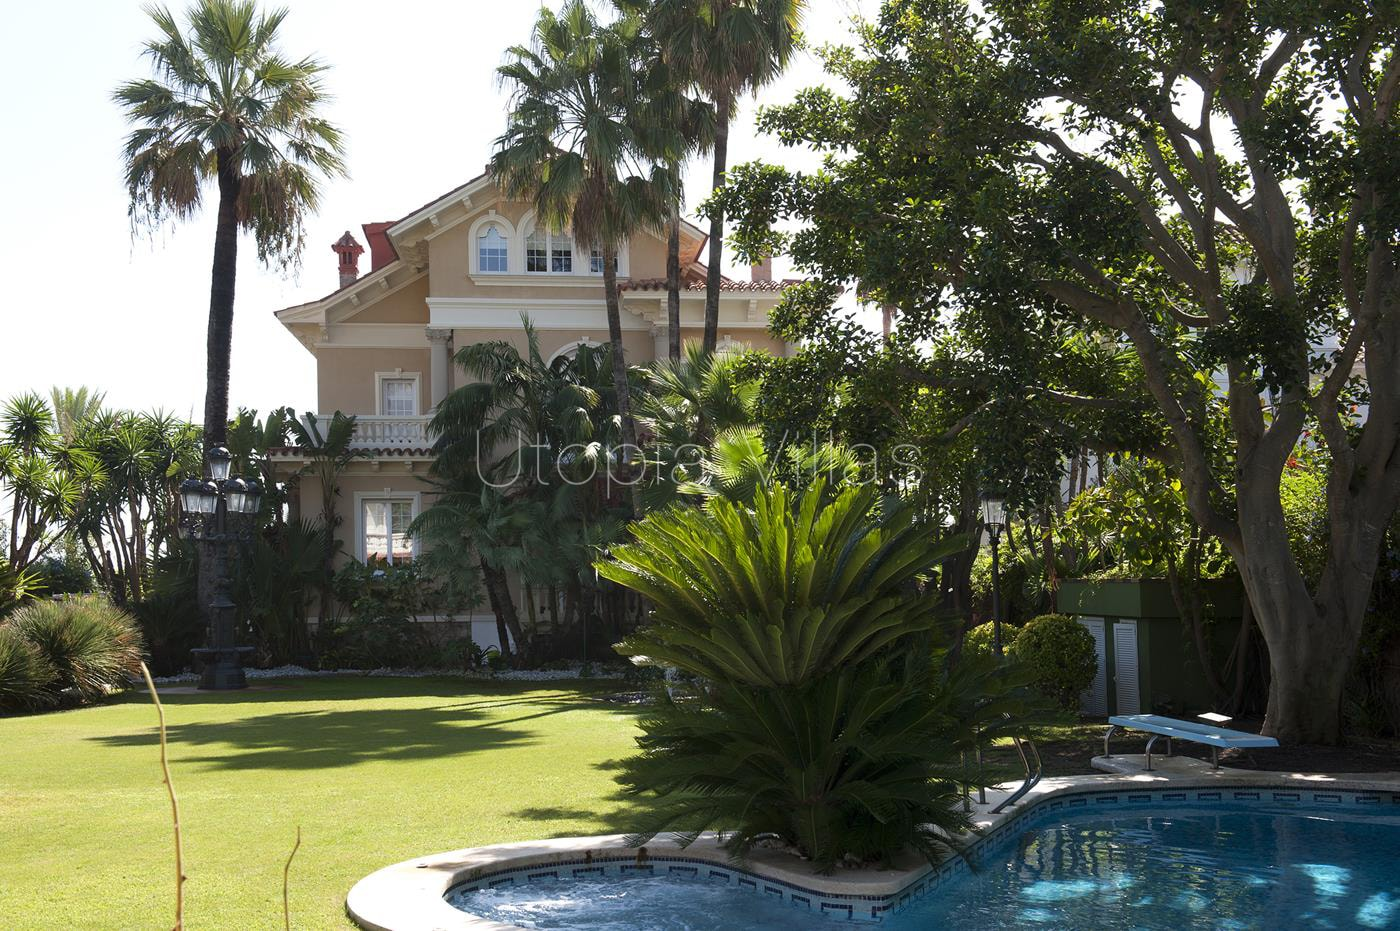 1-Gardenview-VillaIslaCozumel-Sitges-Barcelona